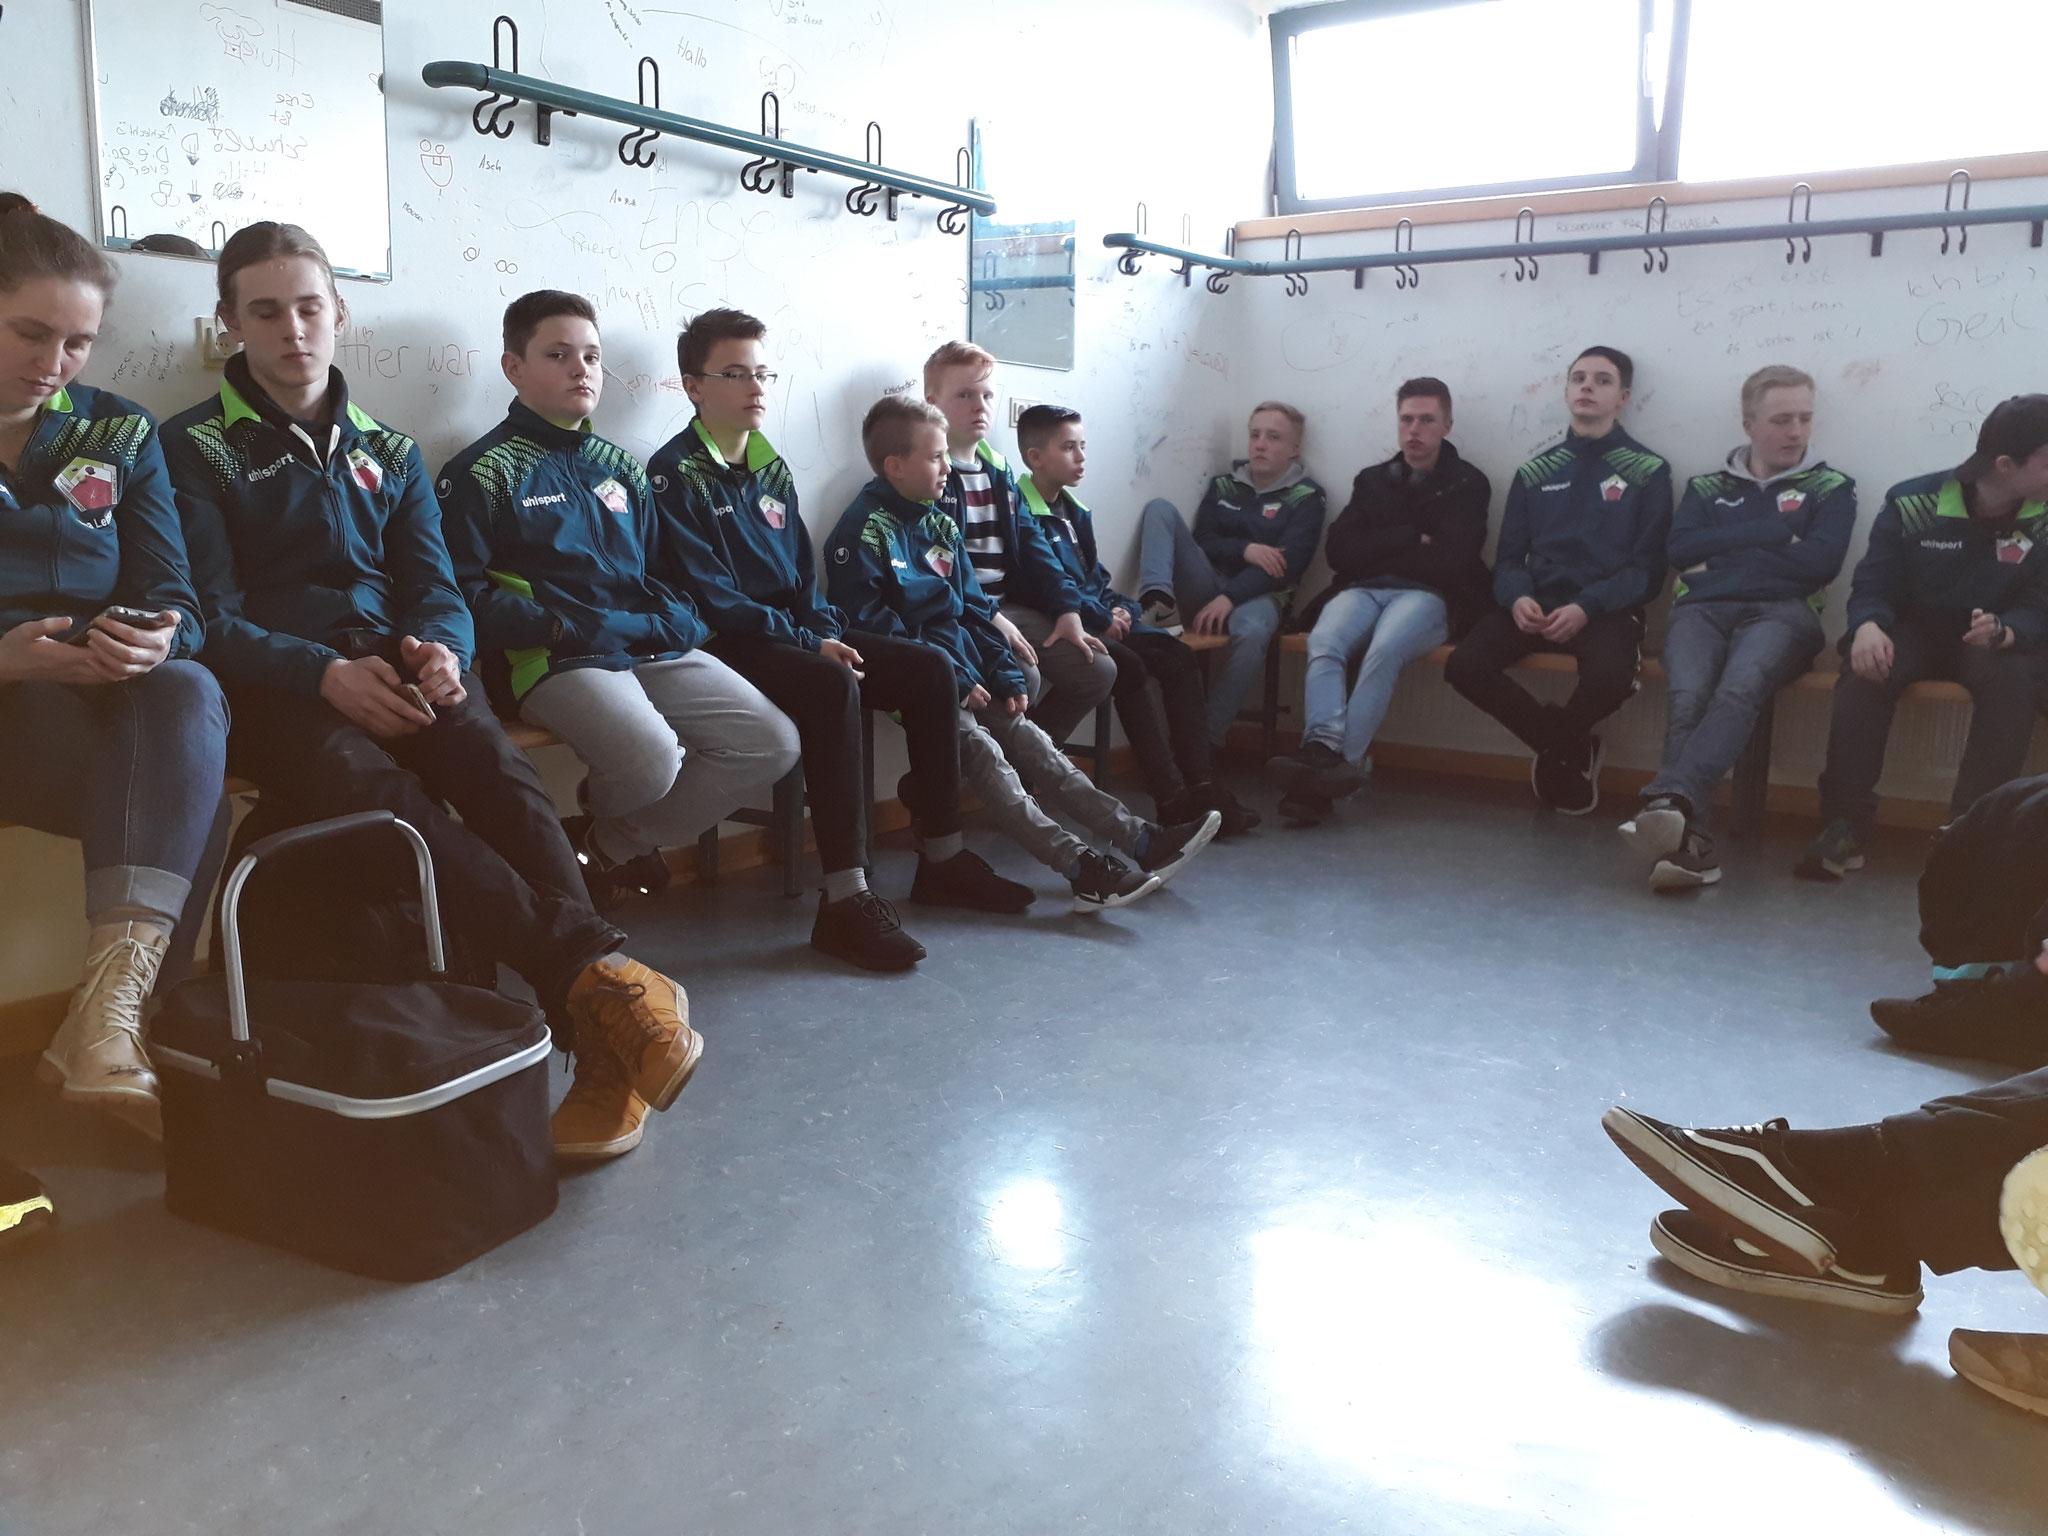 Coaching mit Eric Tombeaux in der Umkleiderkabine - Foto: Bergische Pool Union